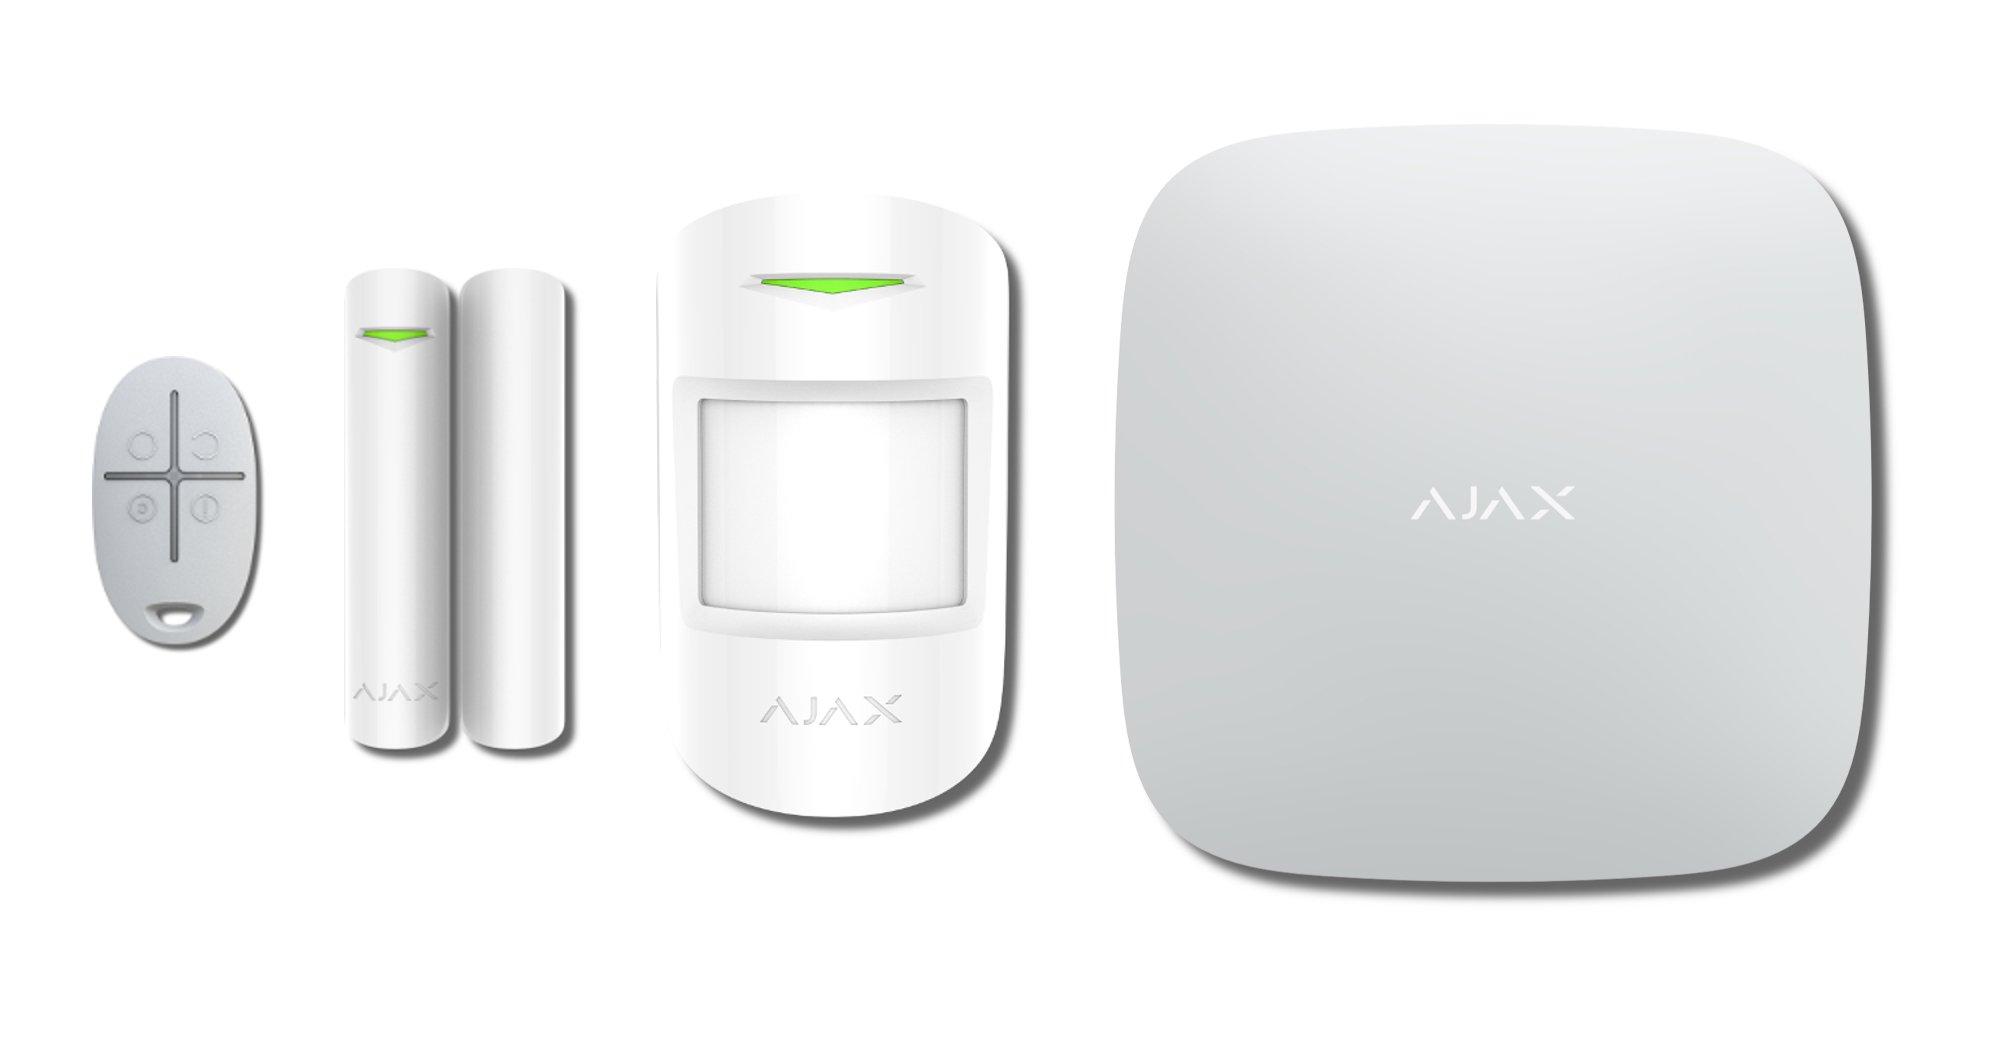 Картинки по запросу Ajax Starter Kit